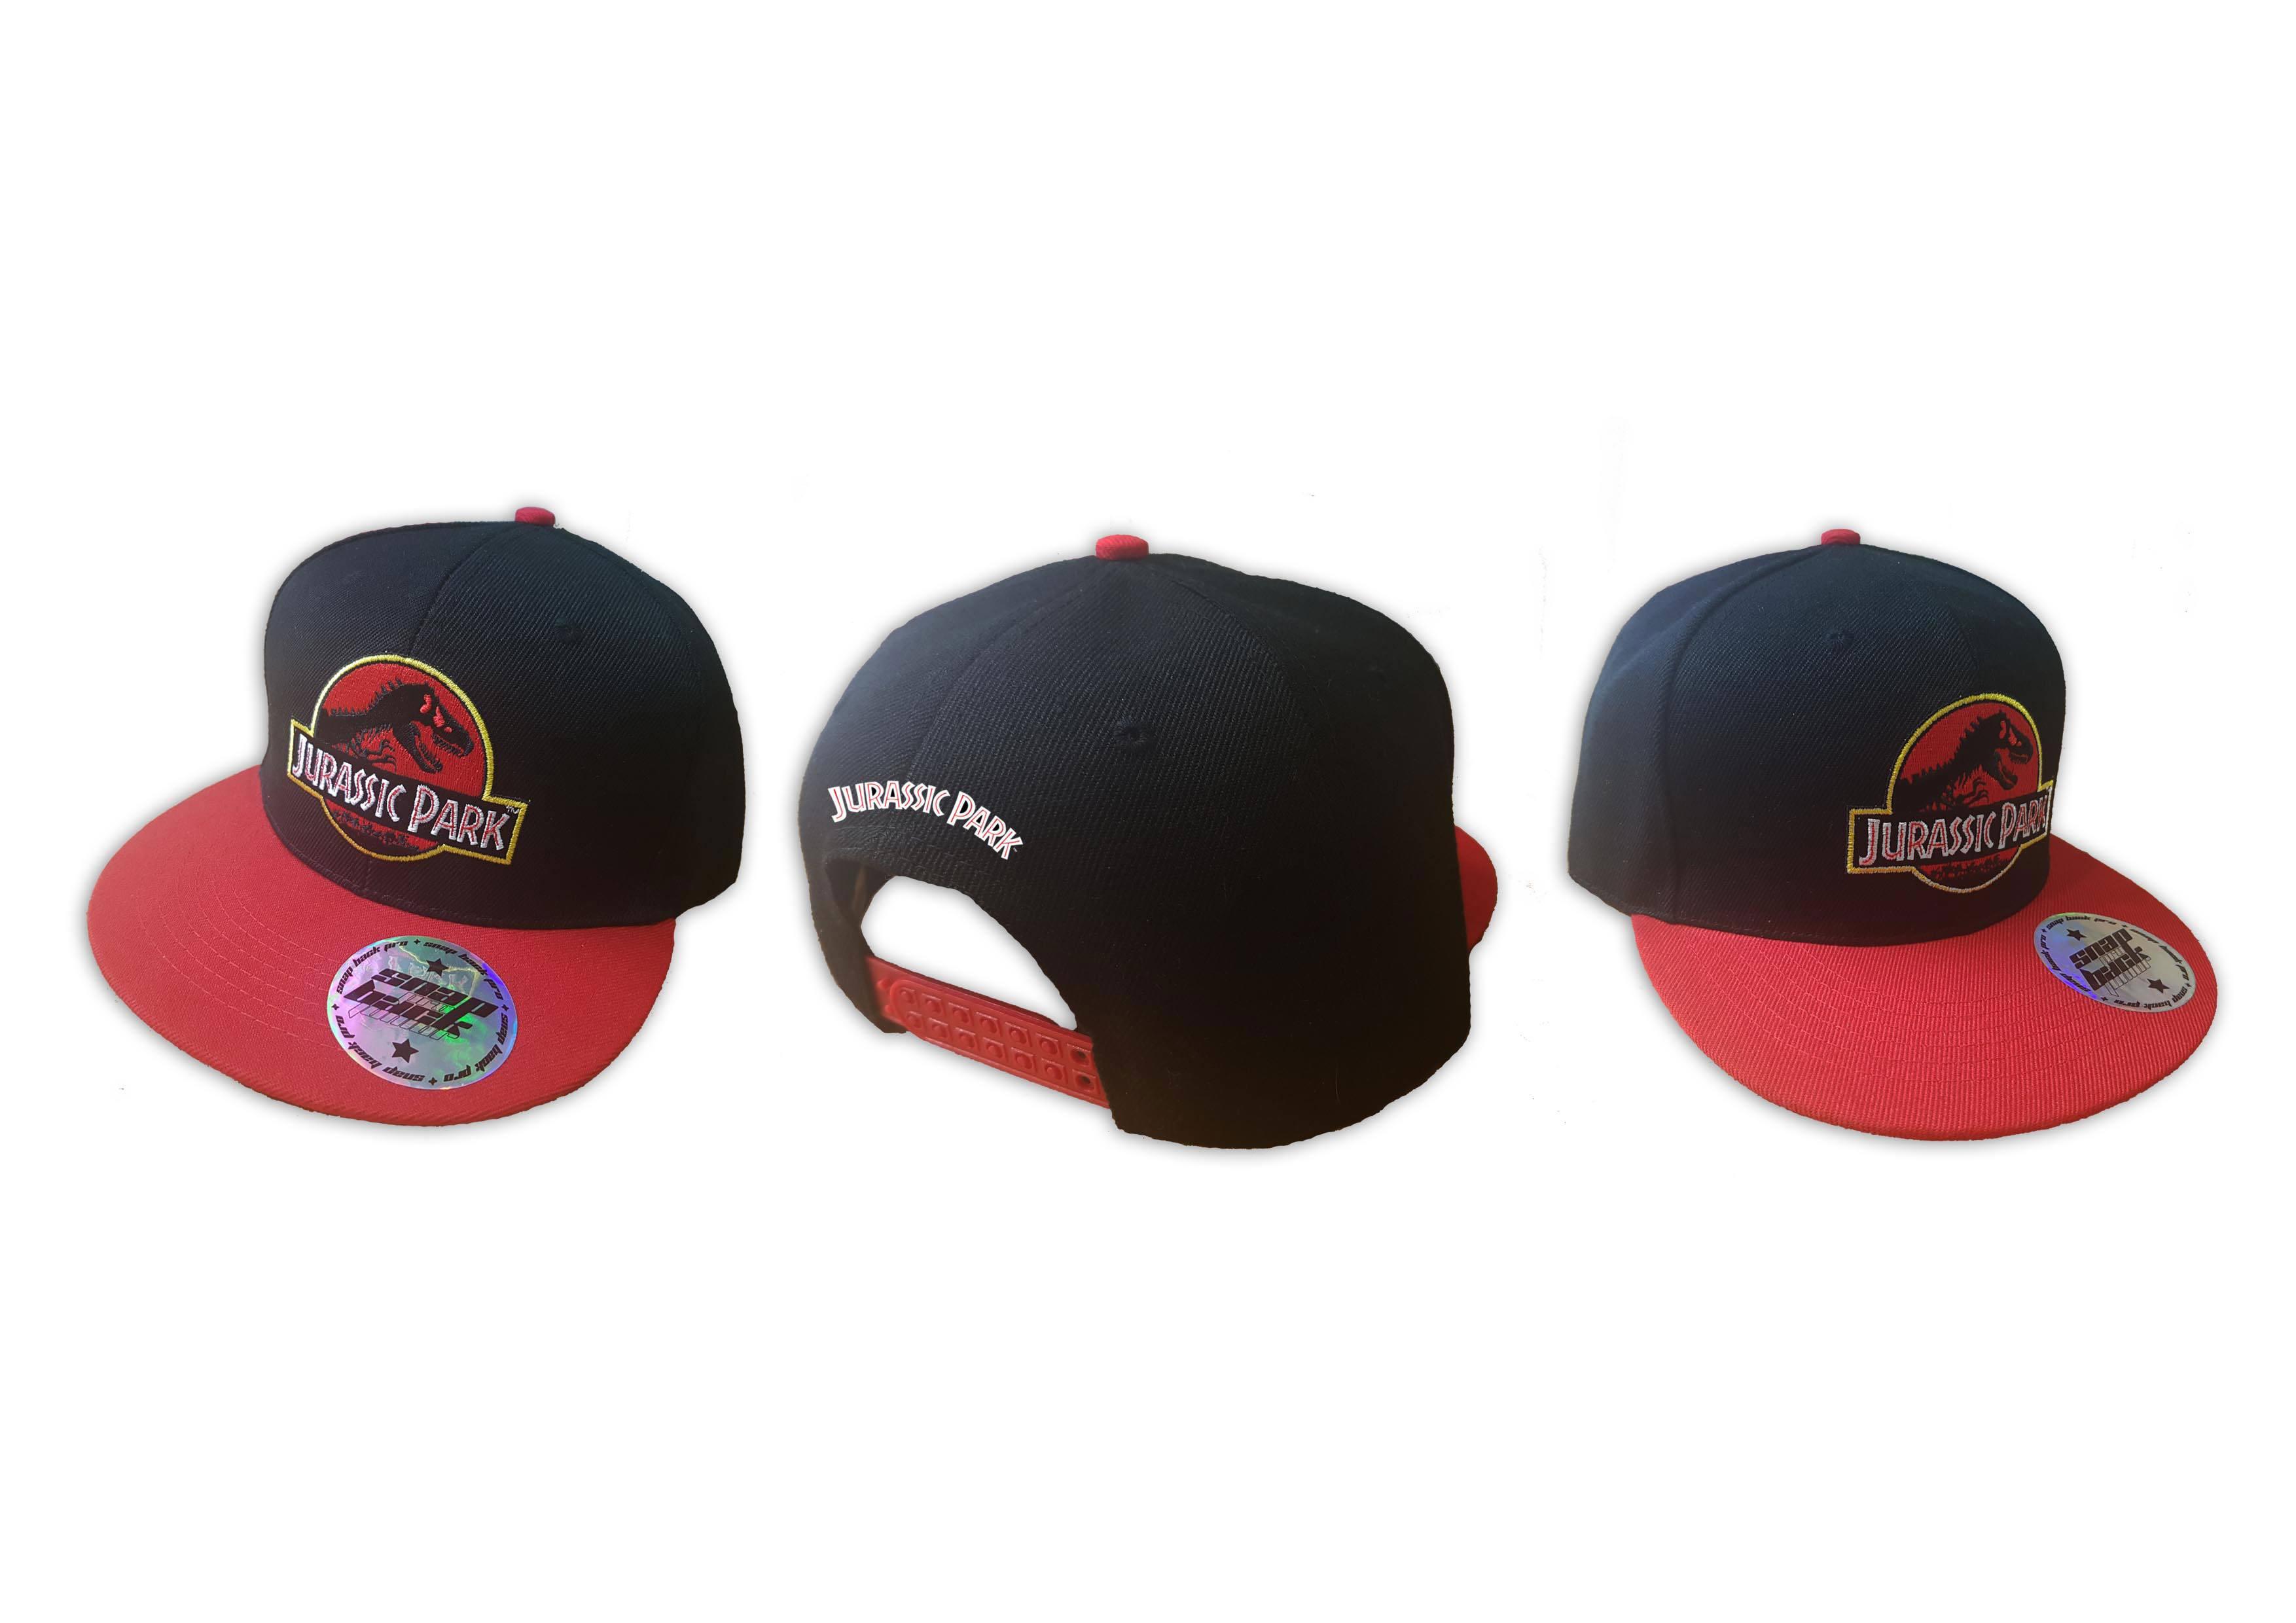 Jurassic Park Snap Back Cap Logo